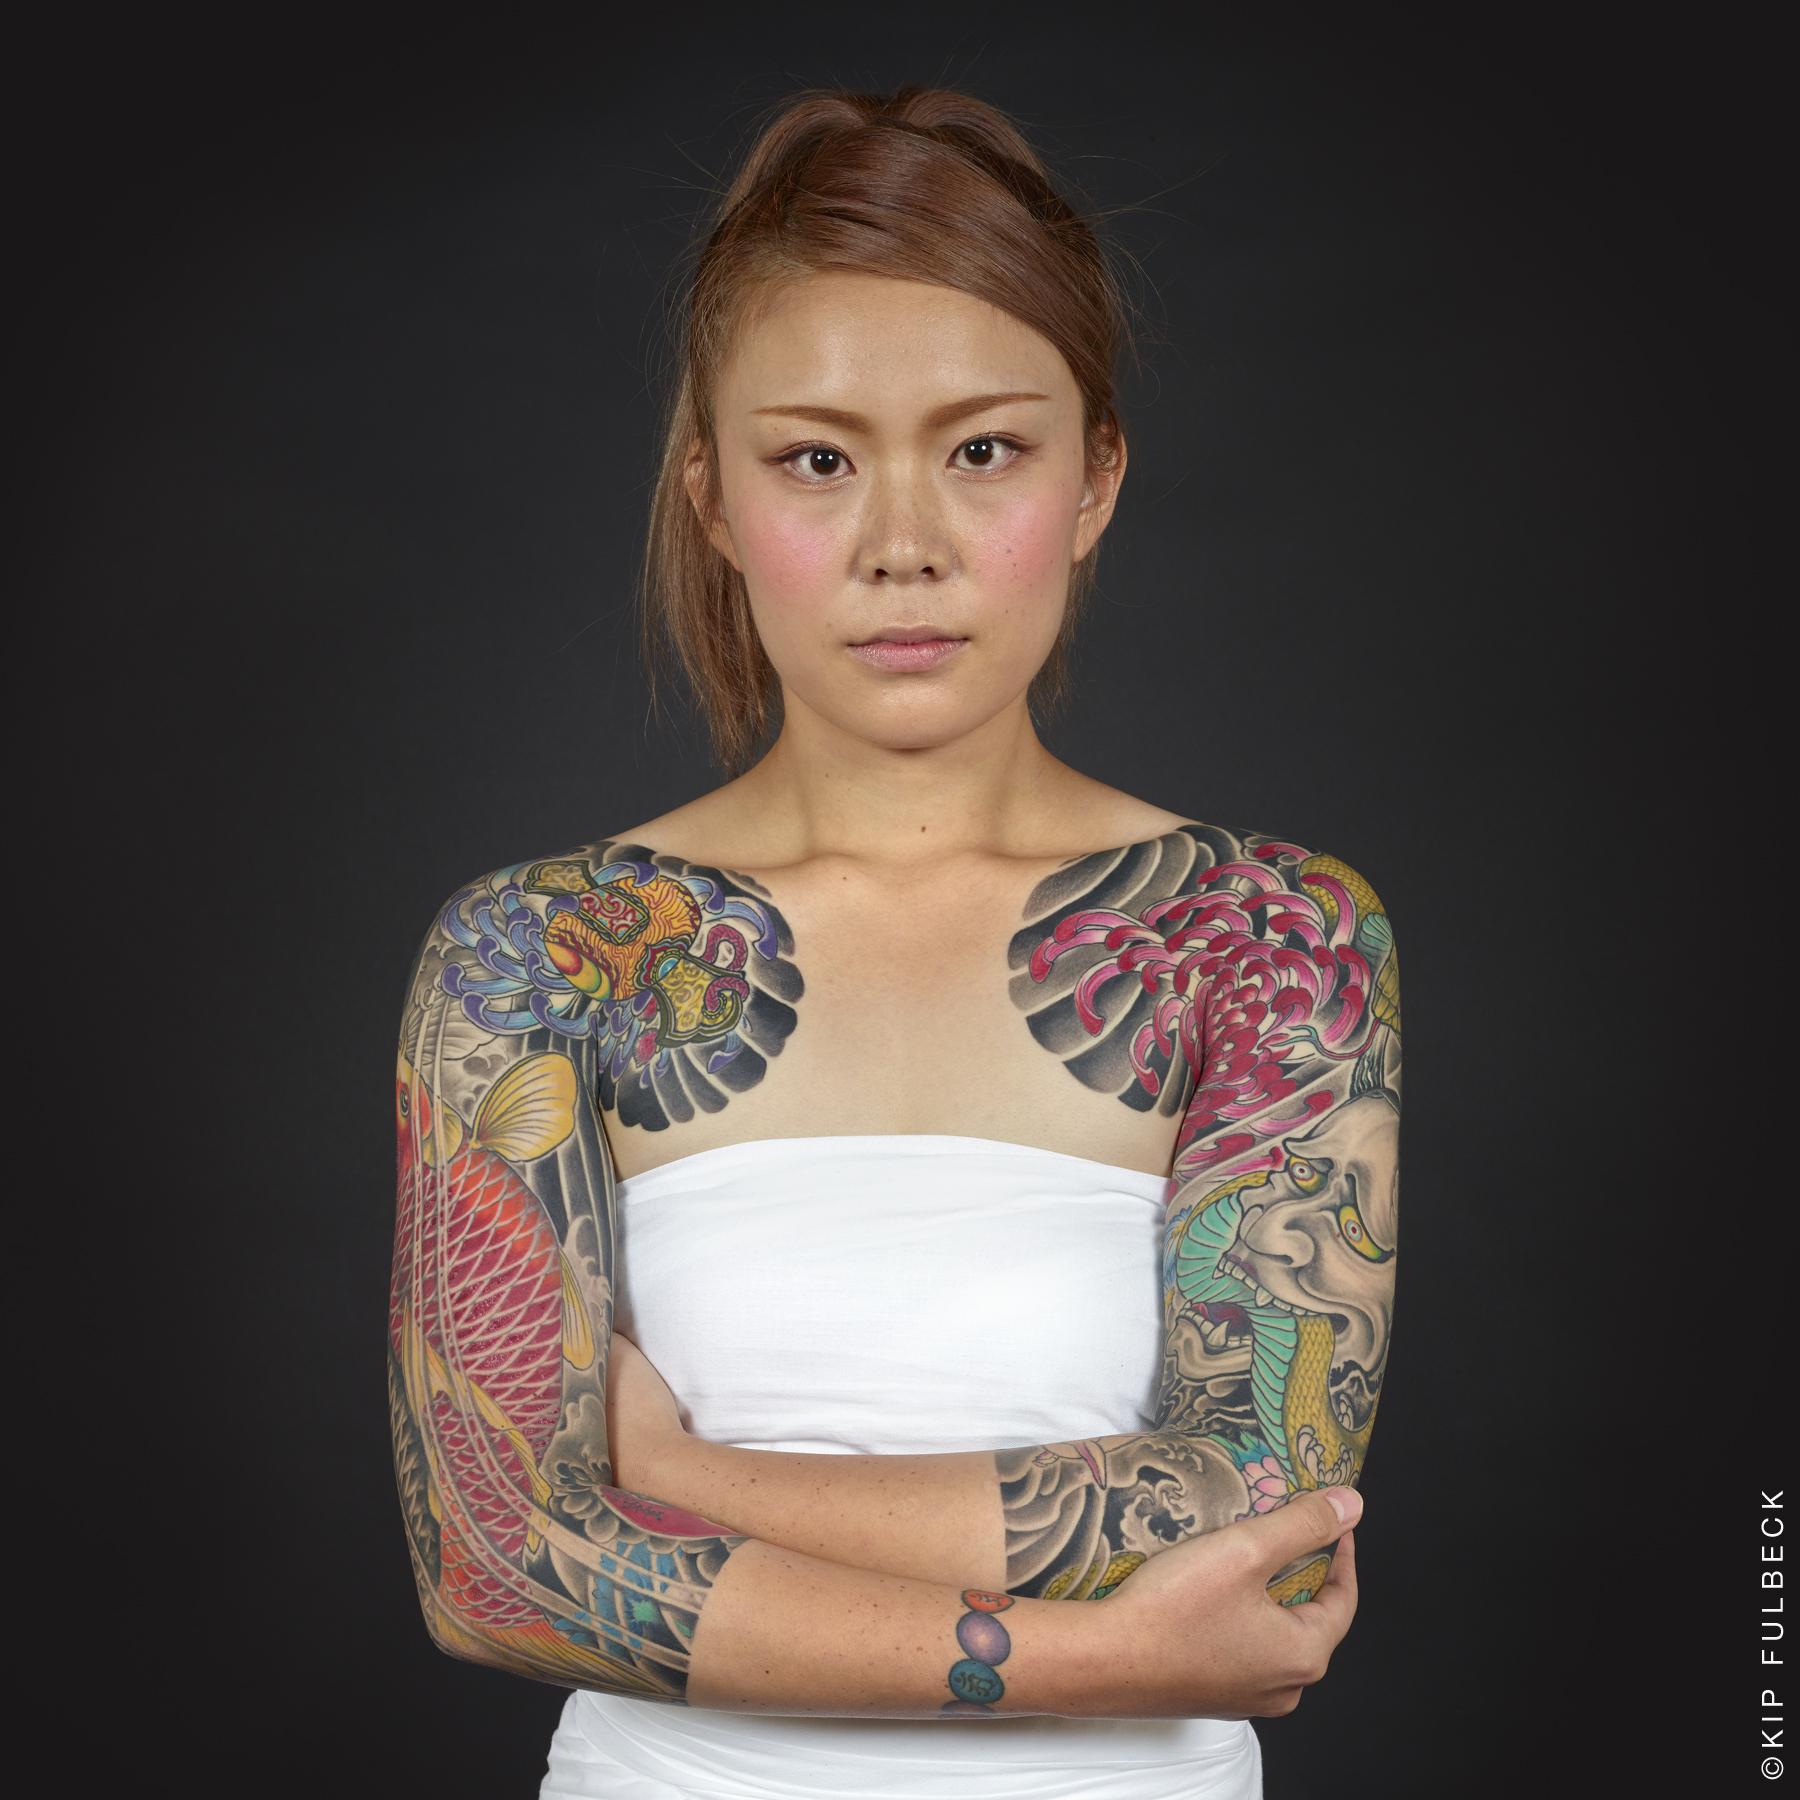 Tattoo by Horikiku. Photo by Kip Fulbeck